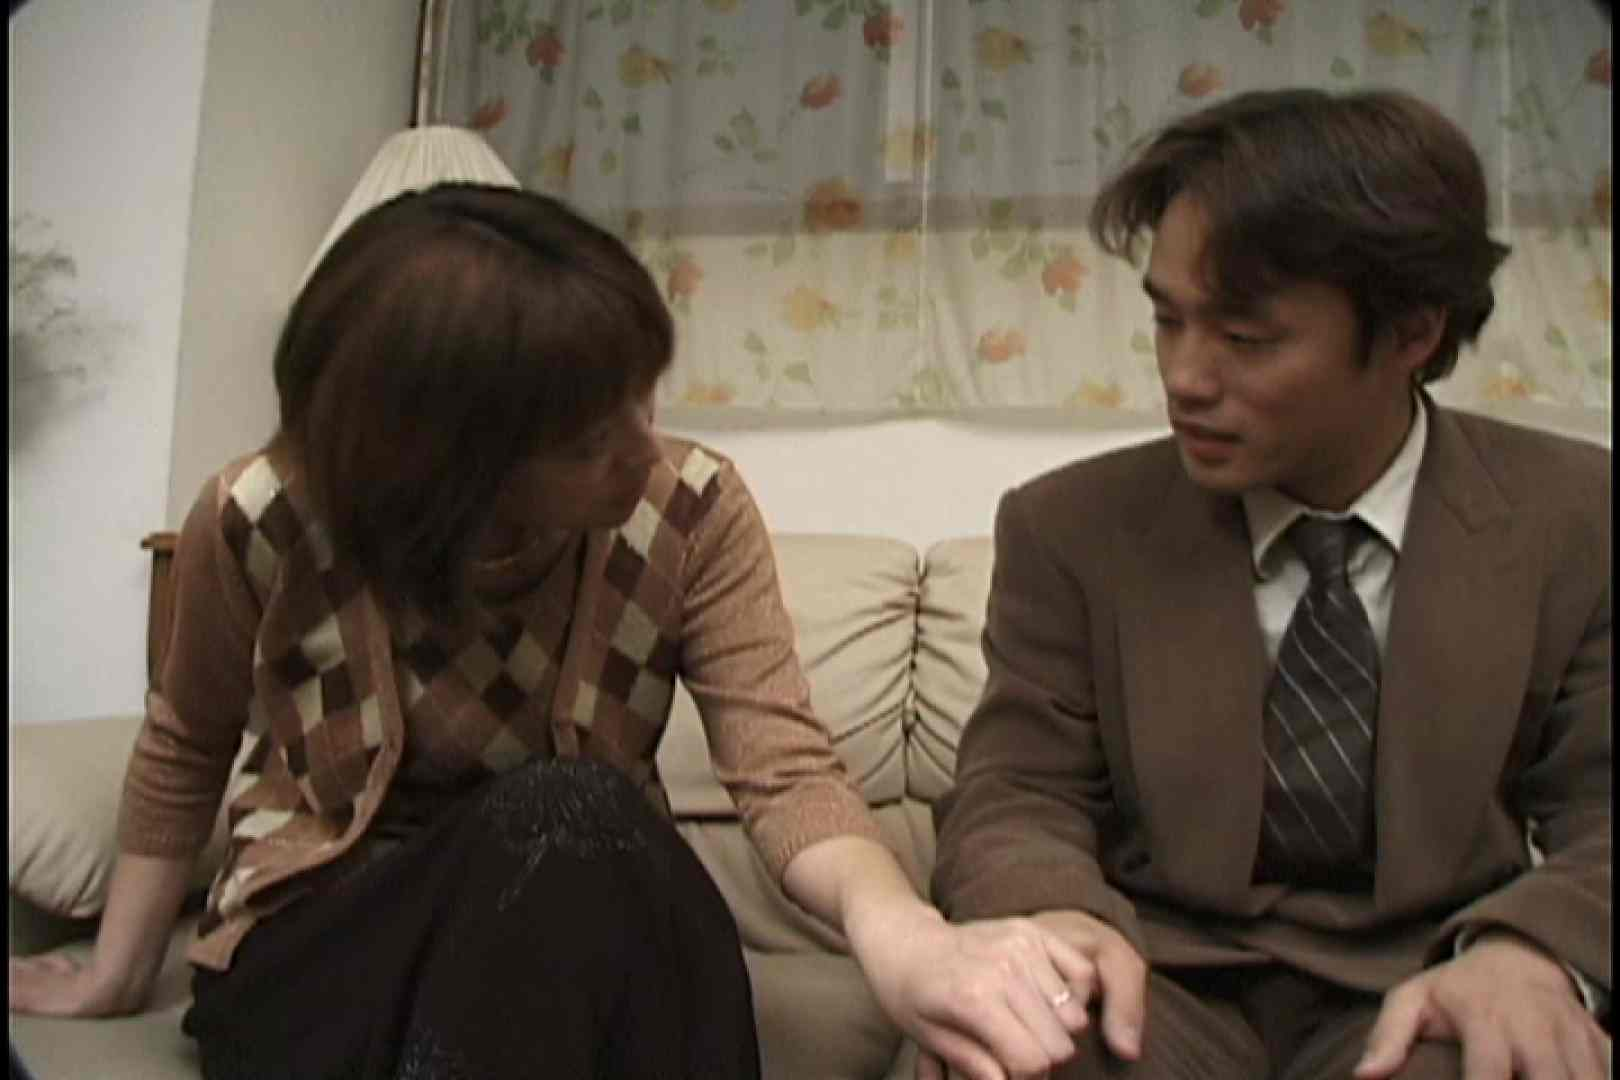 昼間の奥様は欲求不満 ~石川麻紀~ 熟女  111連発 23